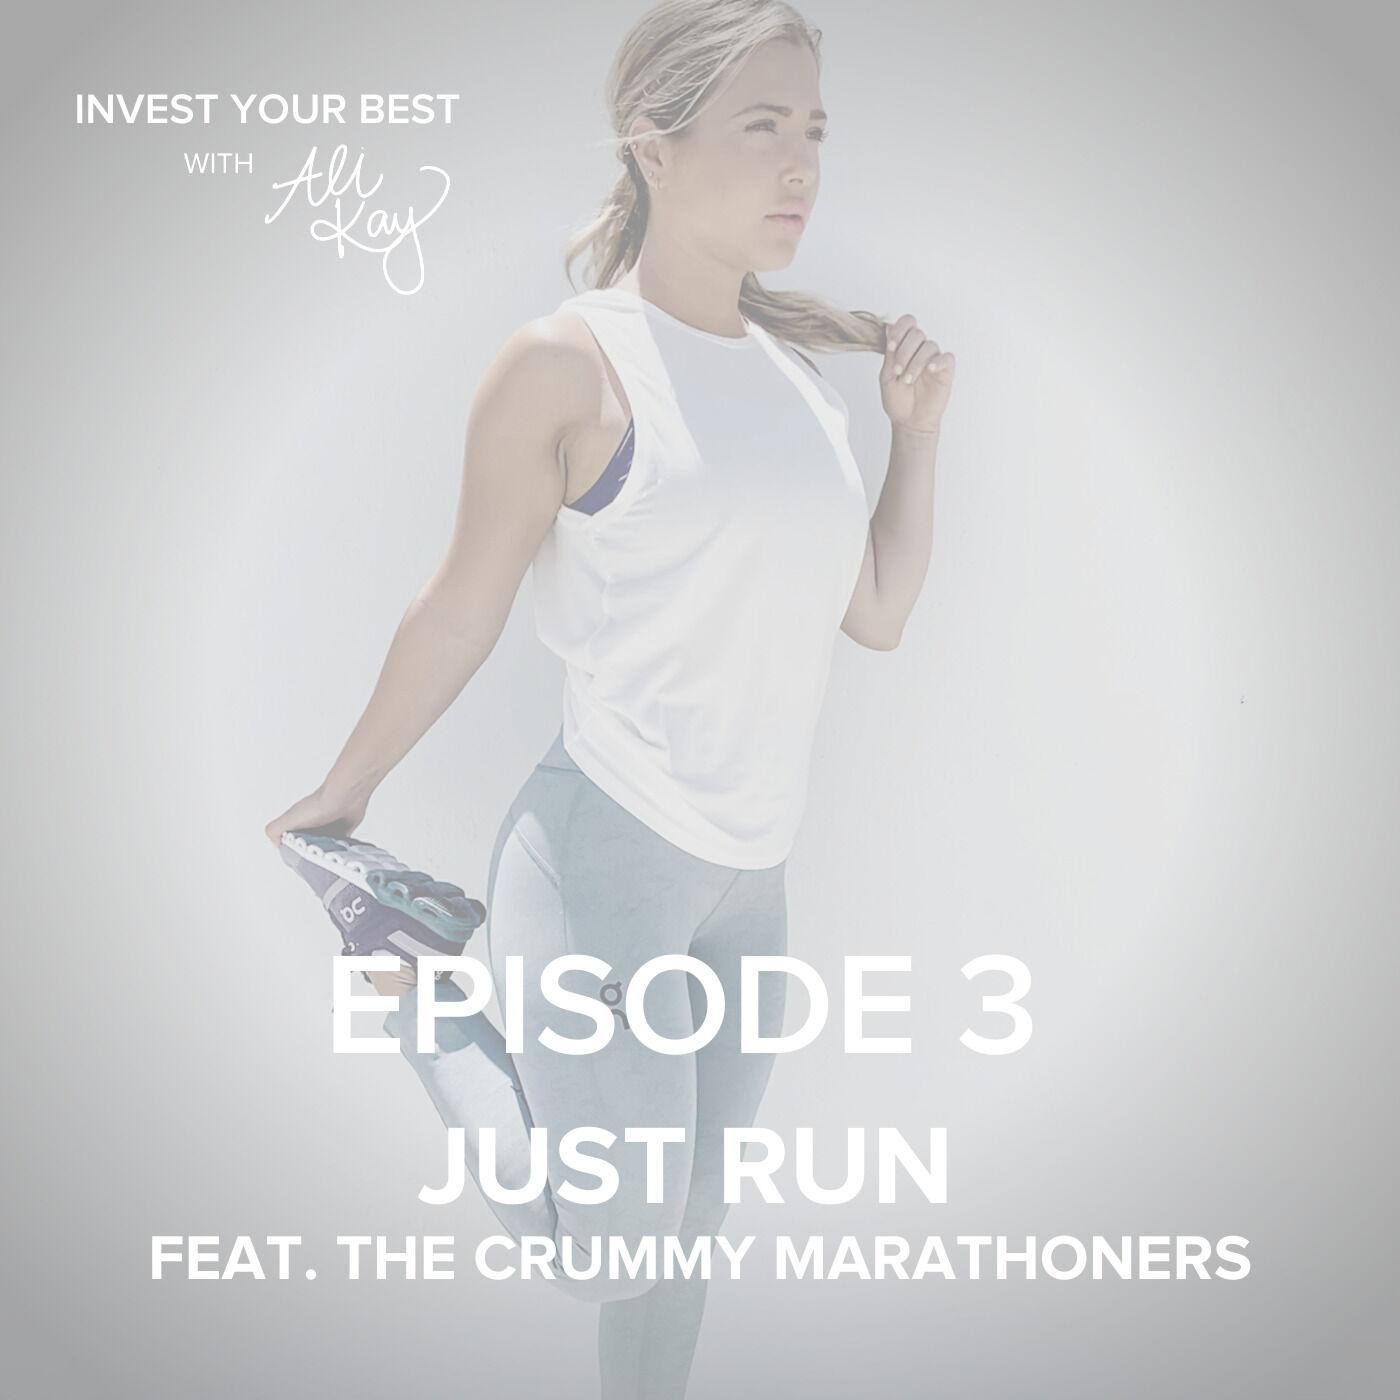 Just Run feat. The Crummy Marathoners